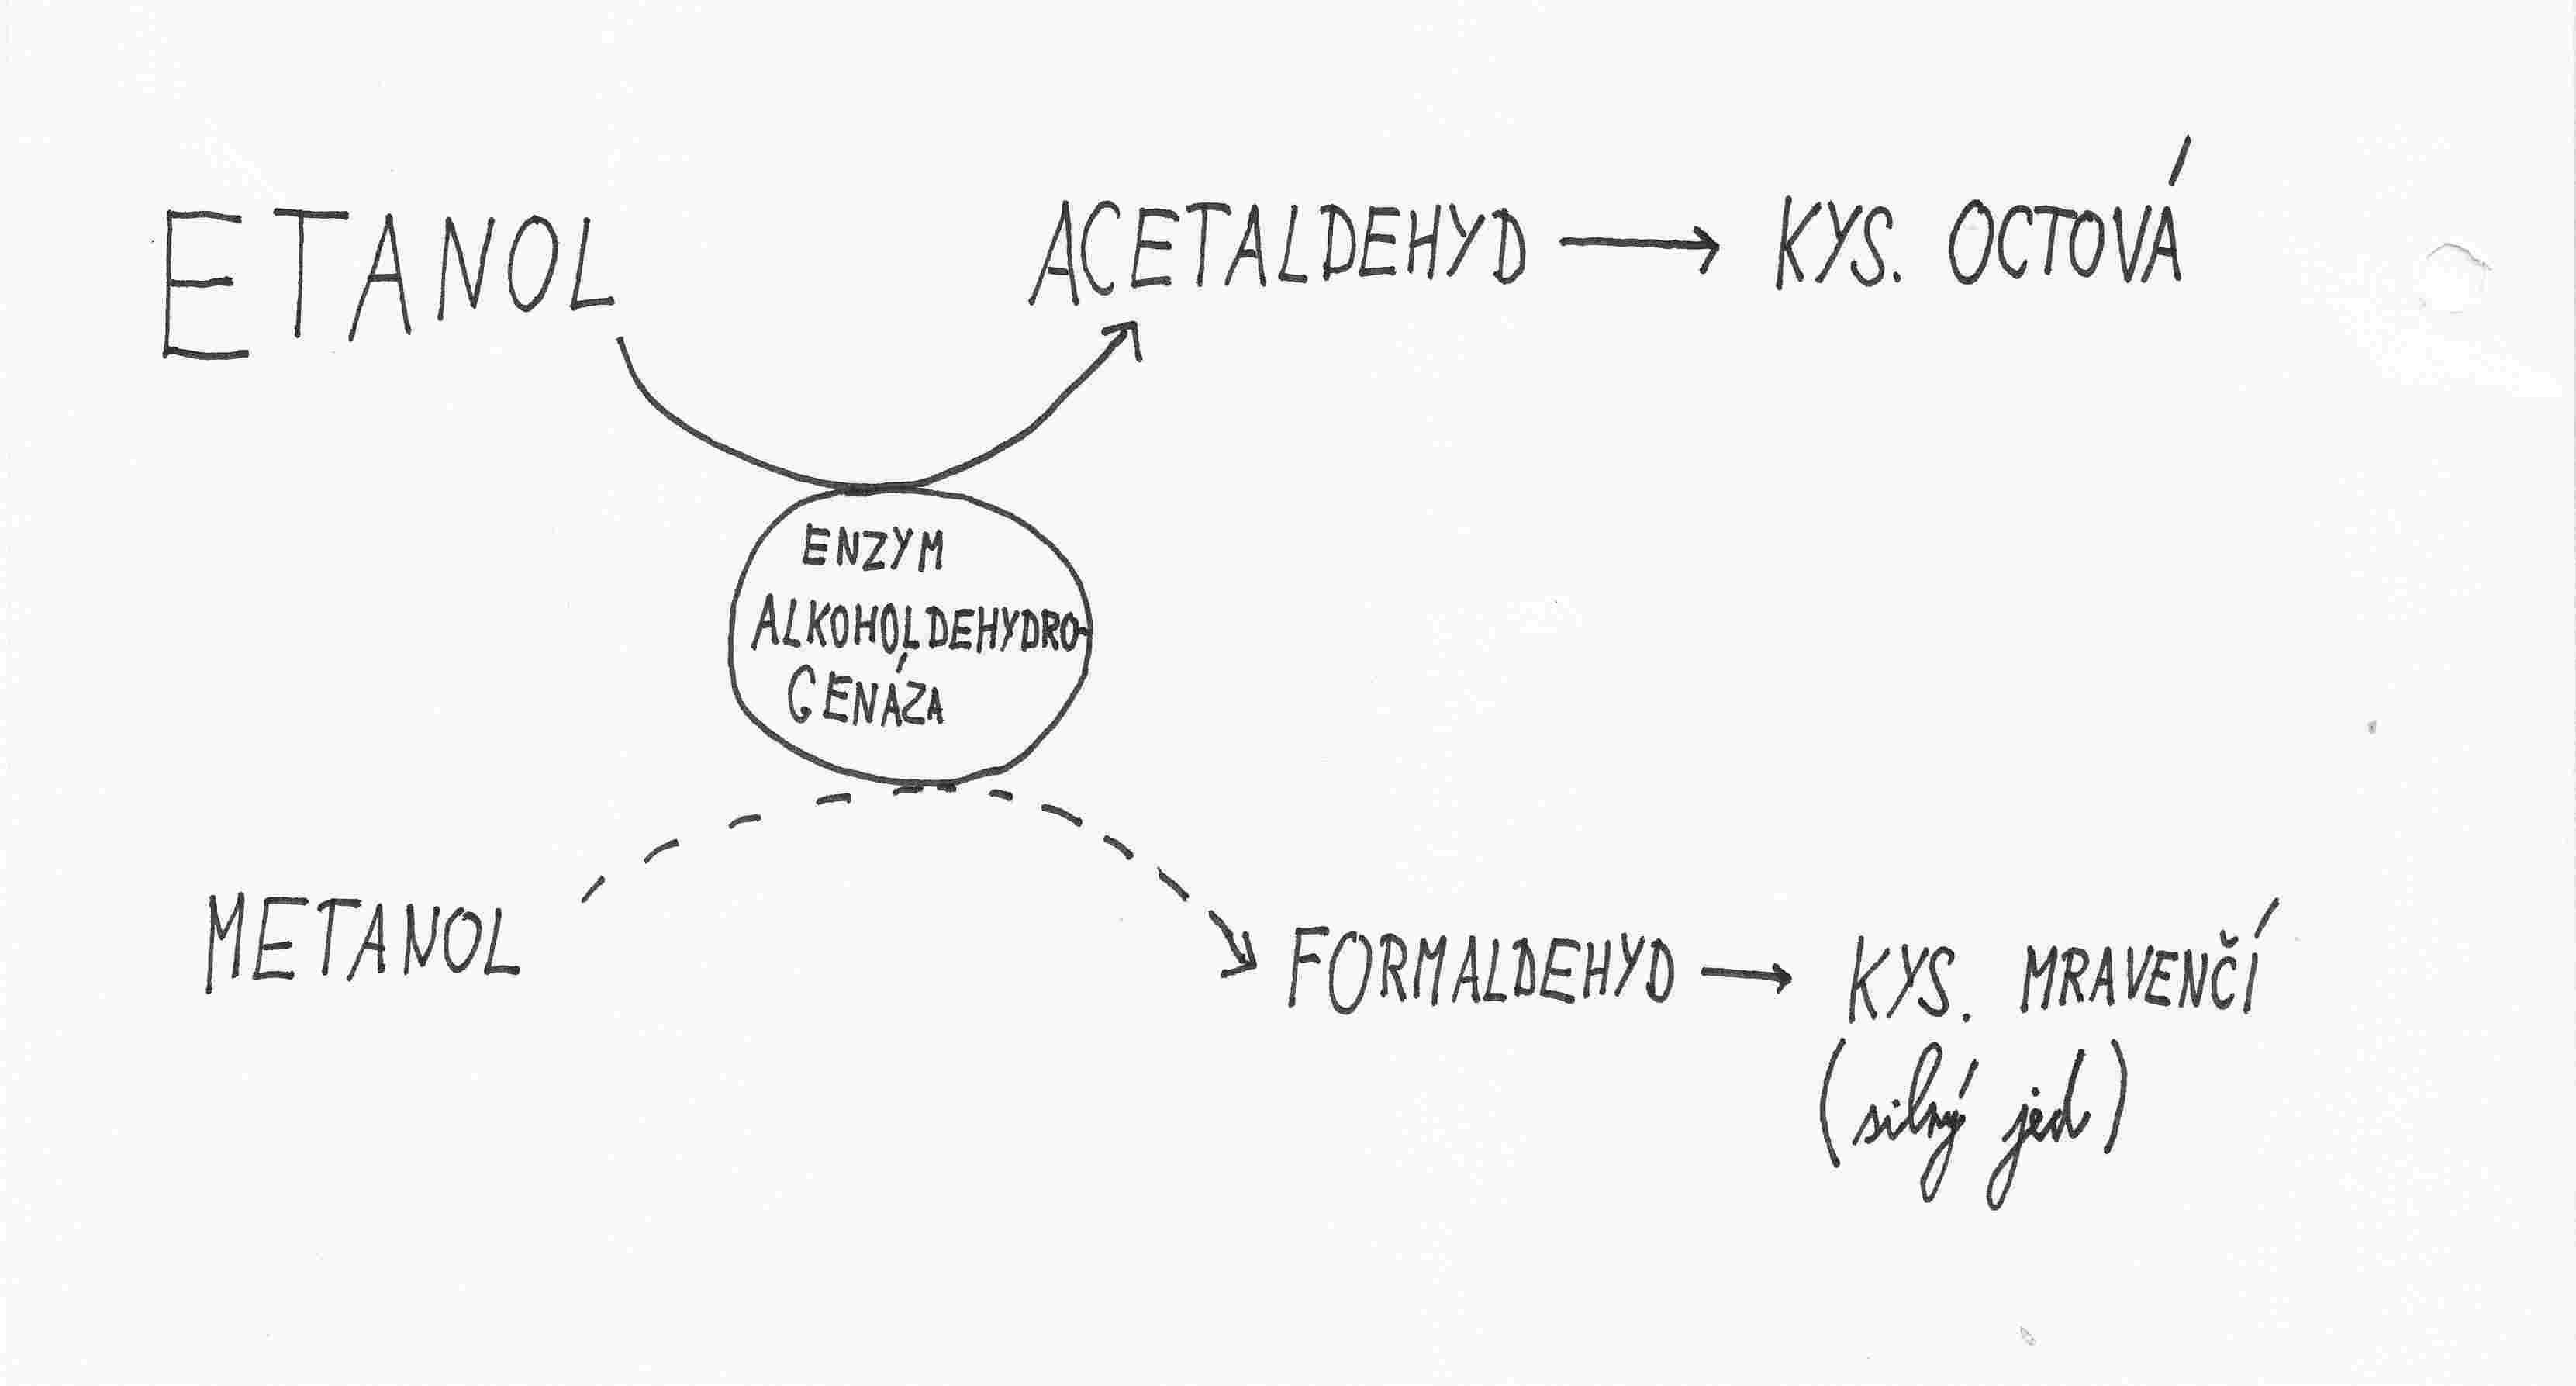 Otrava metanolem - schema